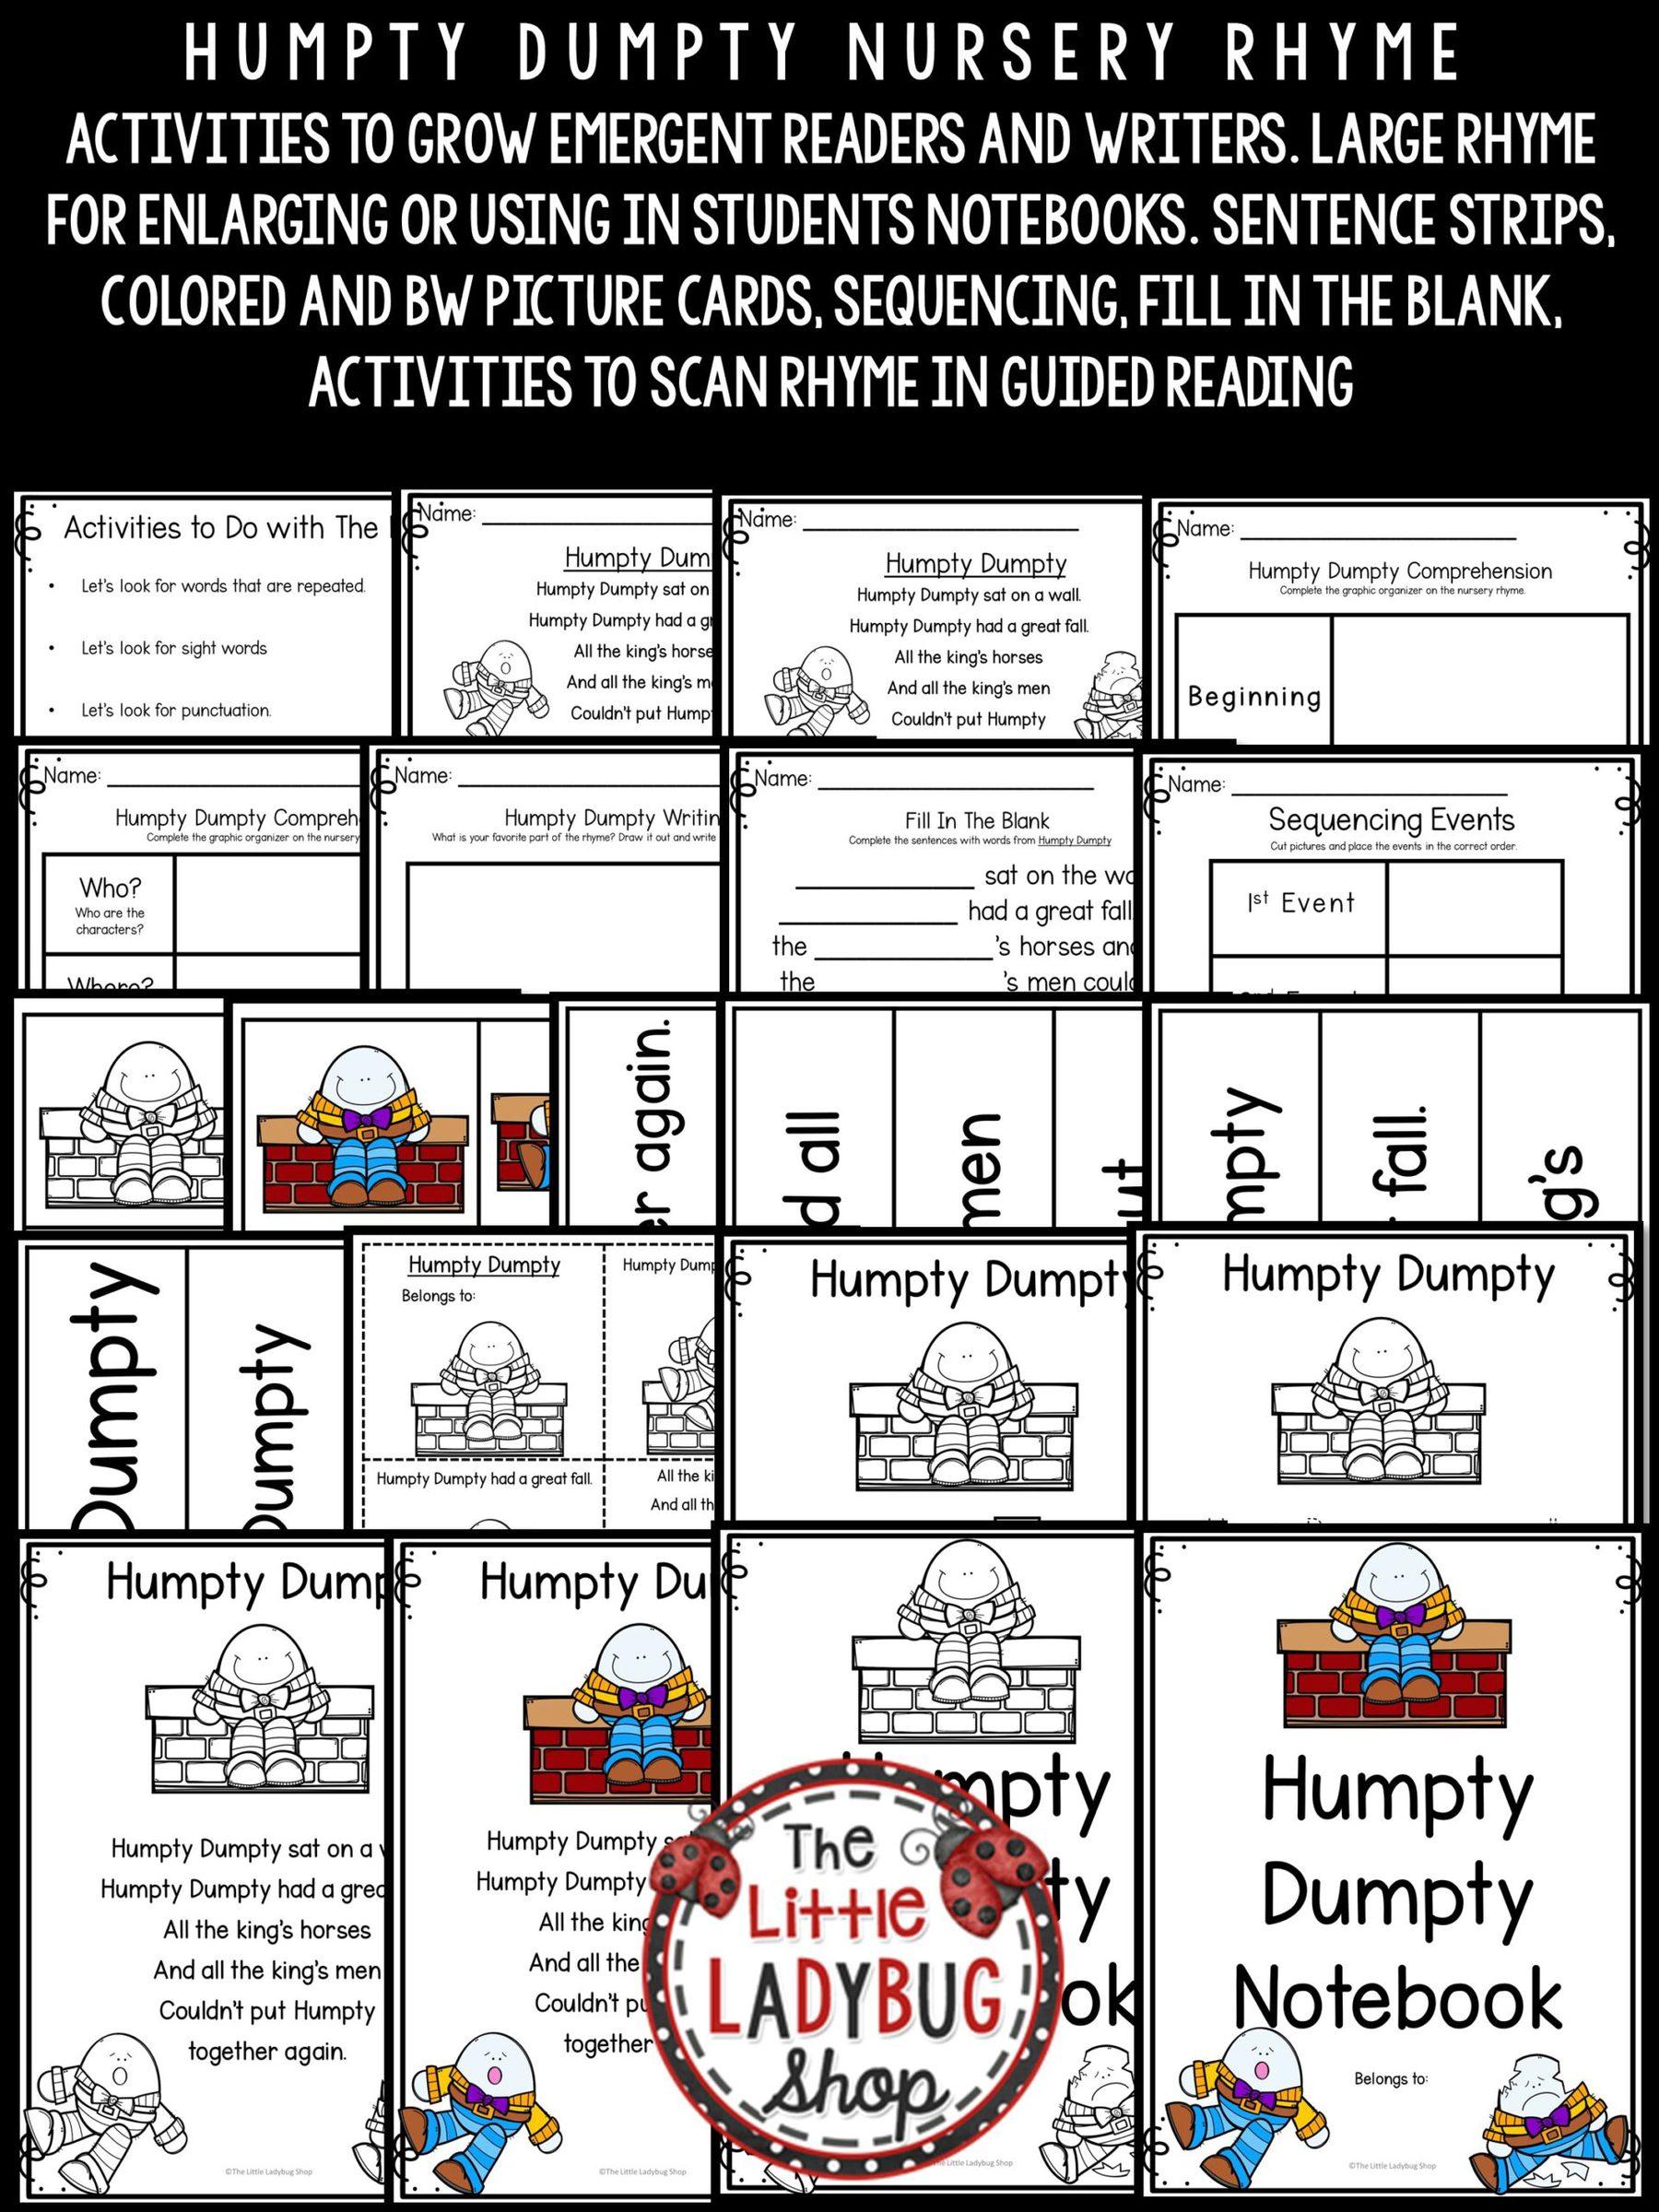 Humpty Dumpty Nursery Rhyme For Kindergarten Nursery